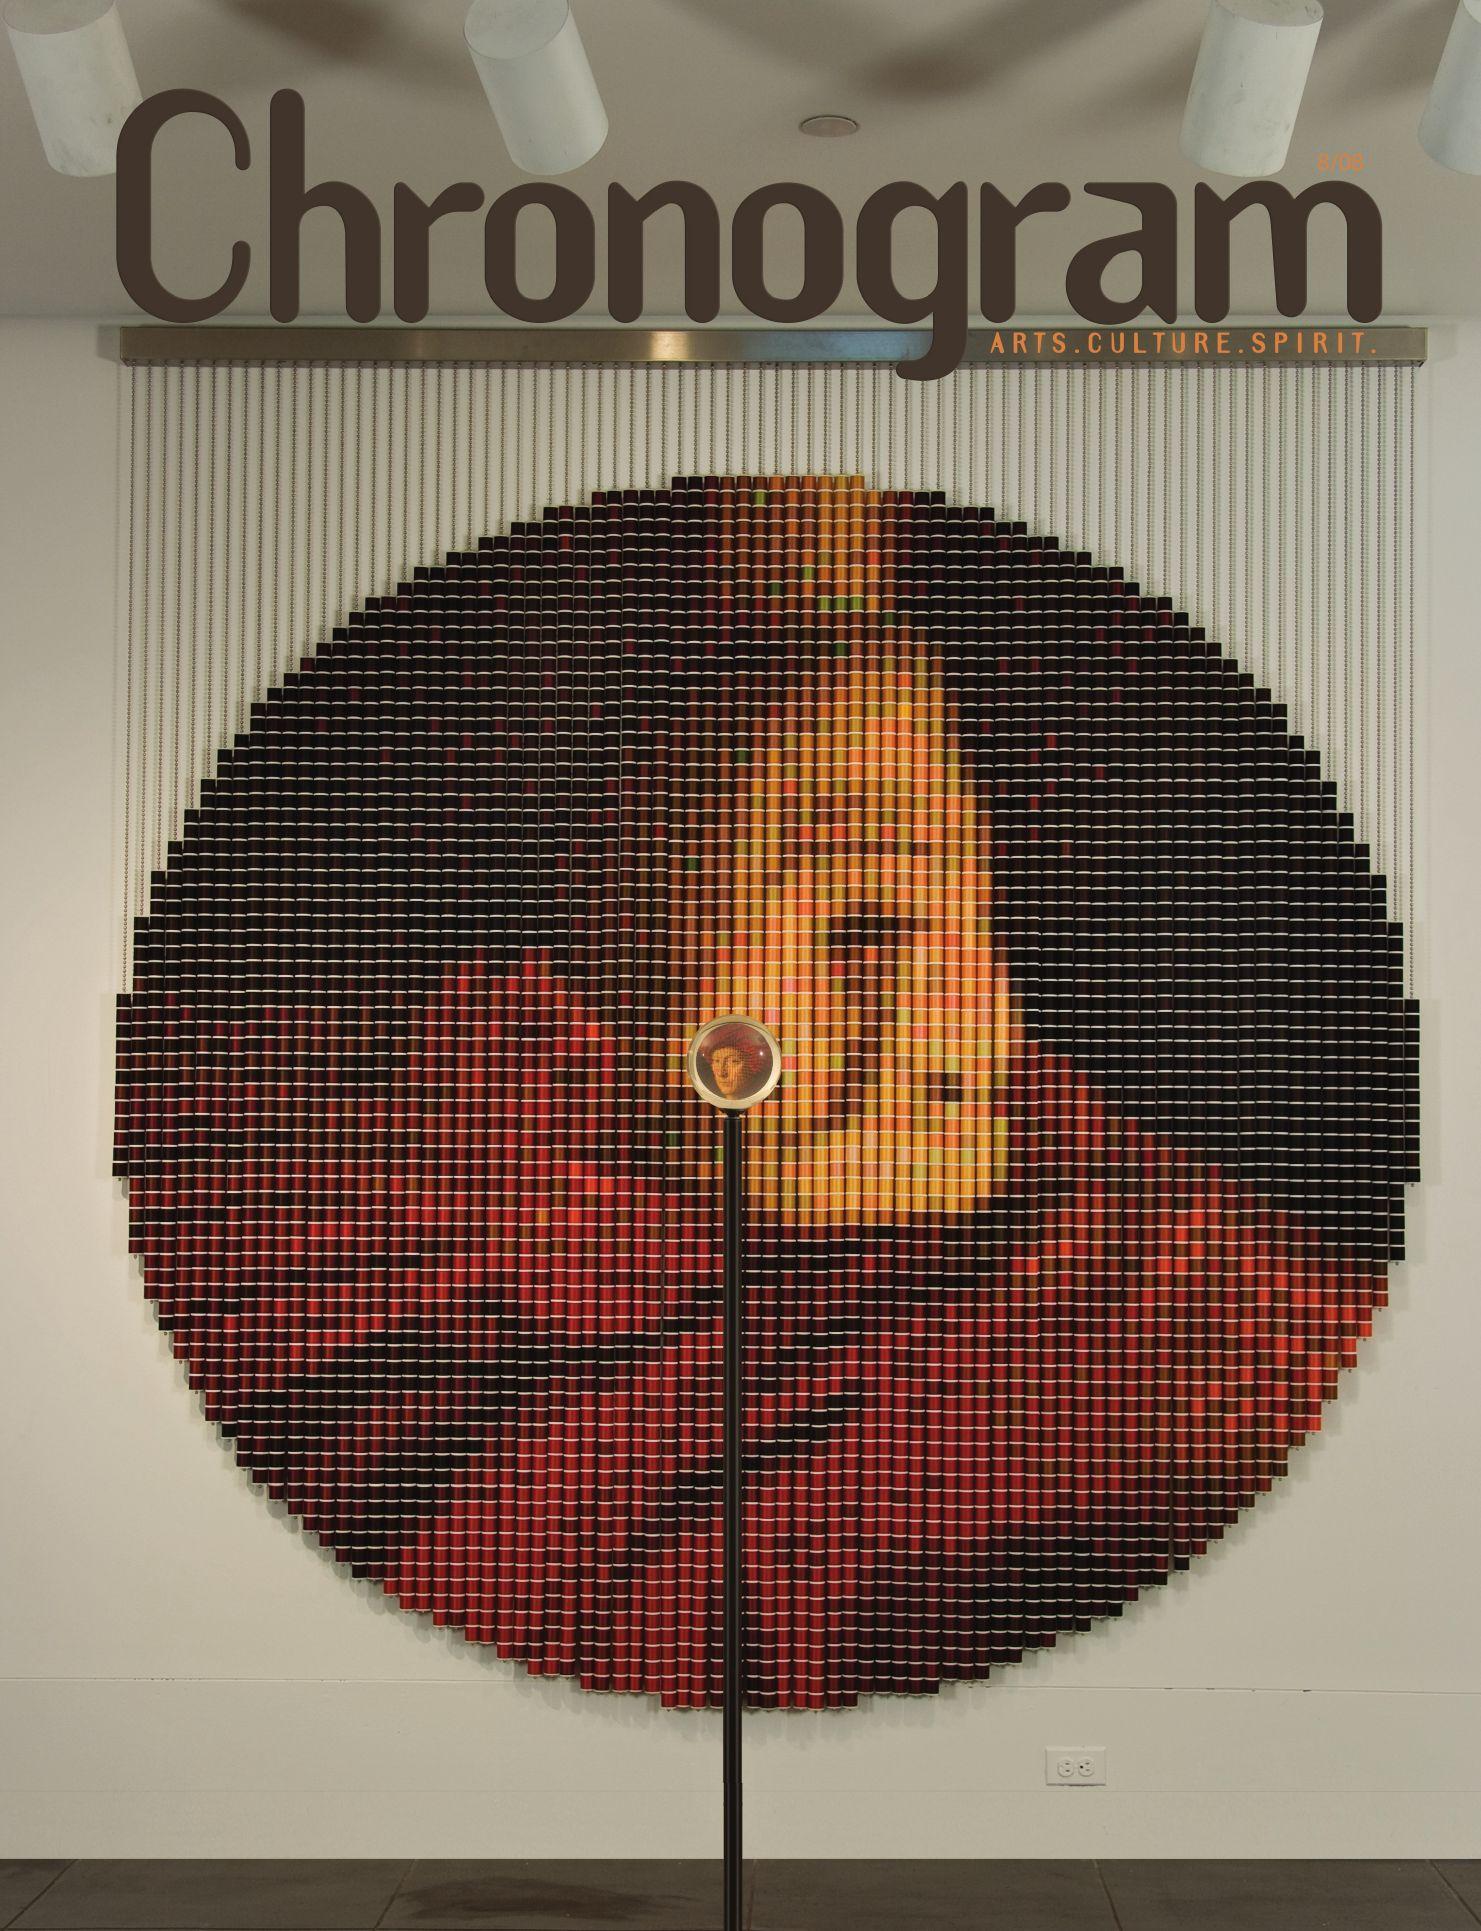 Chronogram - August 2008 by Chronogram - issuu